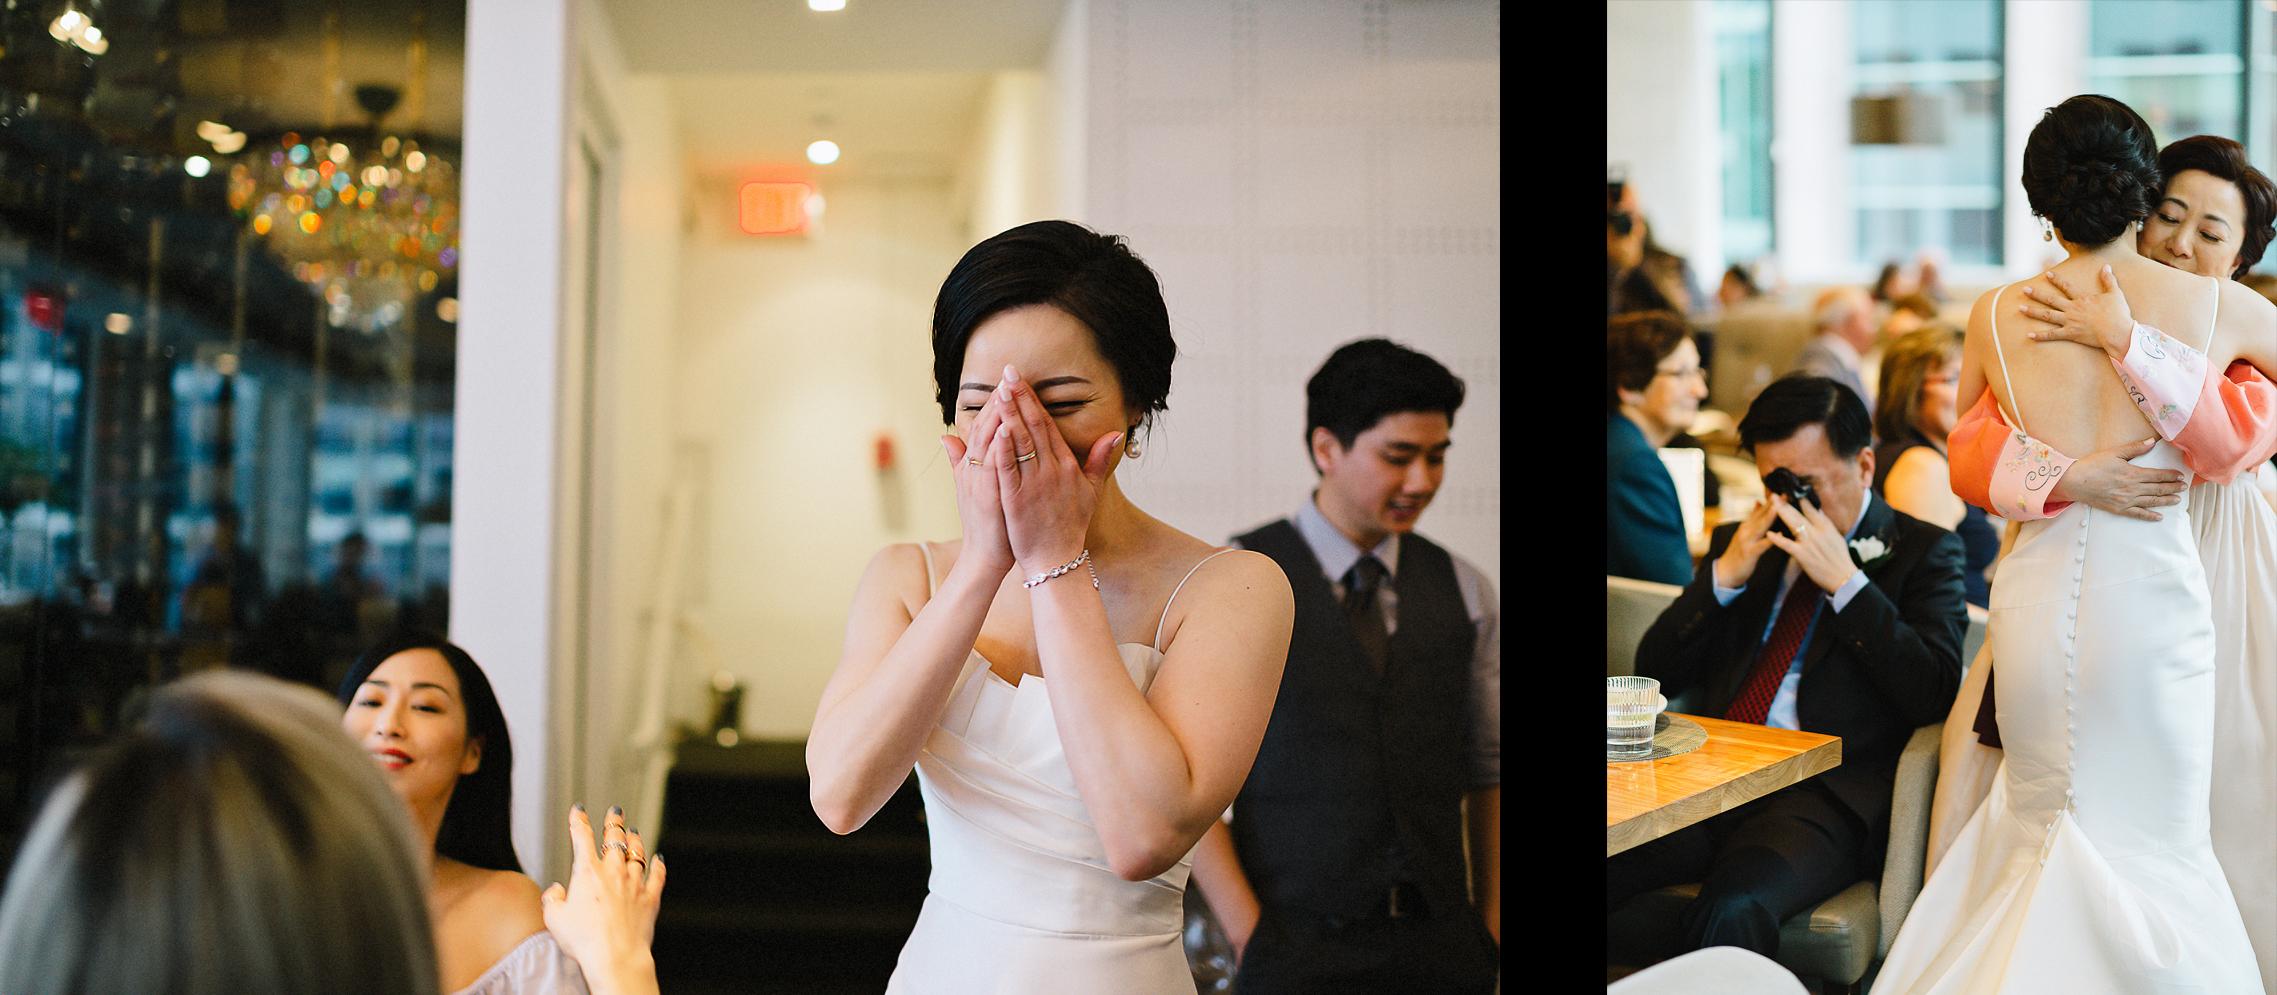 spread-6-Leica-M3-Wedding-Photography-Kodak-TriX--Analog-Wedding-Fine-Art-Film-Downtown-Toronto-Best-Wedding-Photographers--Modern-Vintage-Bride_Mom-and-Dad-Crying.jpg